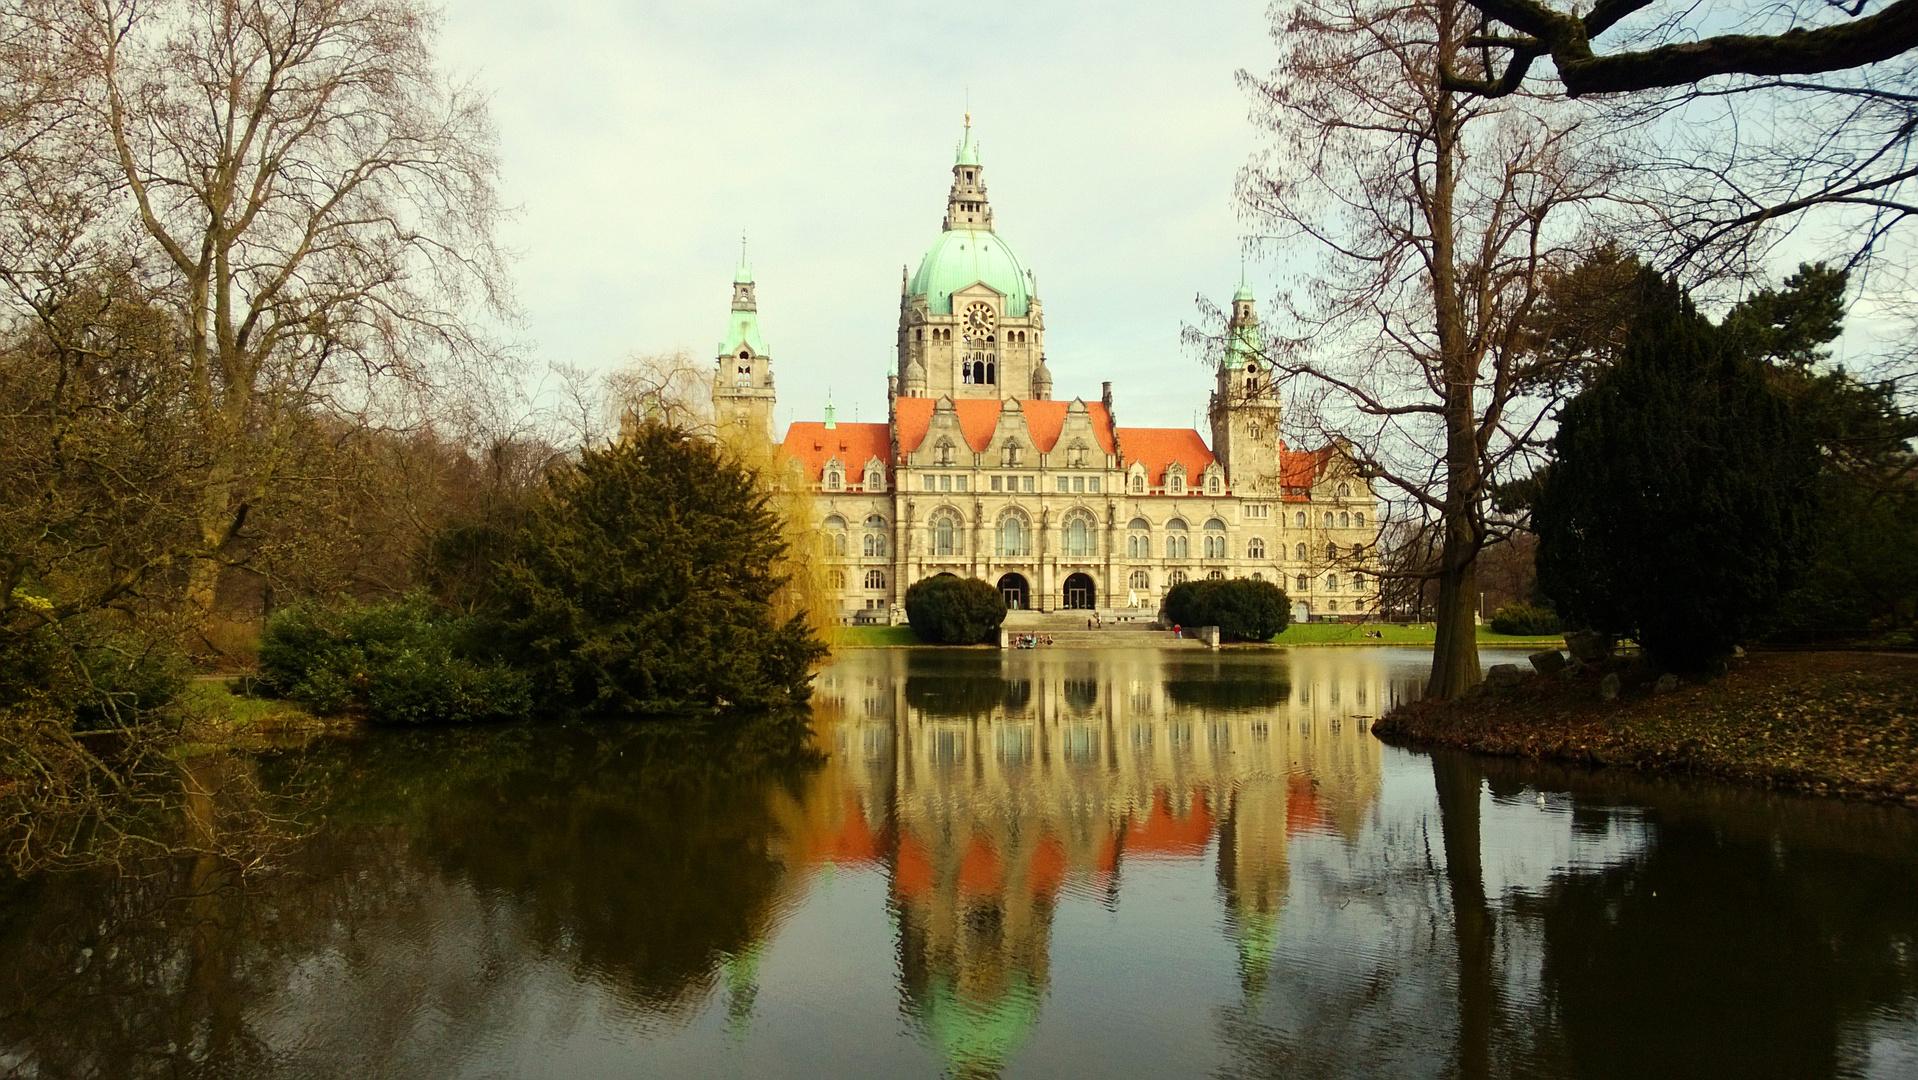 Neues Rathaus Hannover am Frühlingsanfang